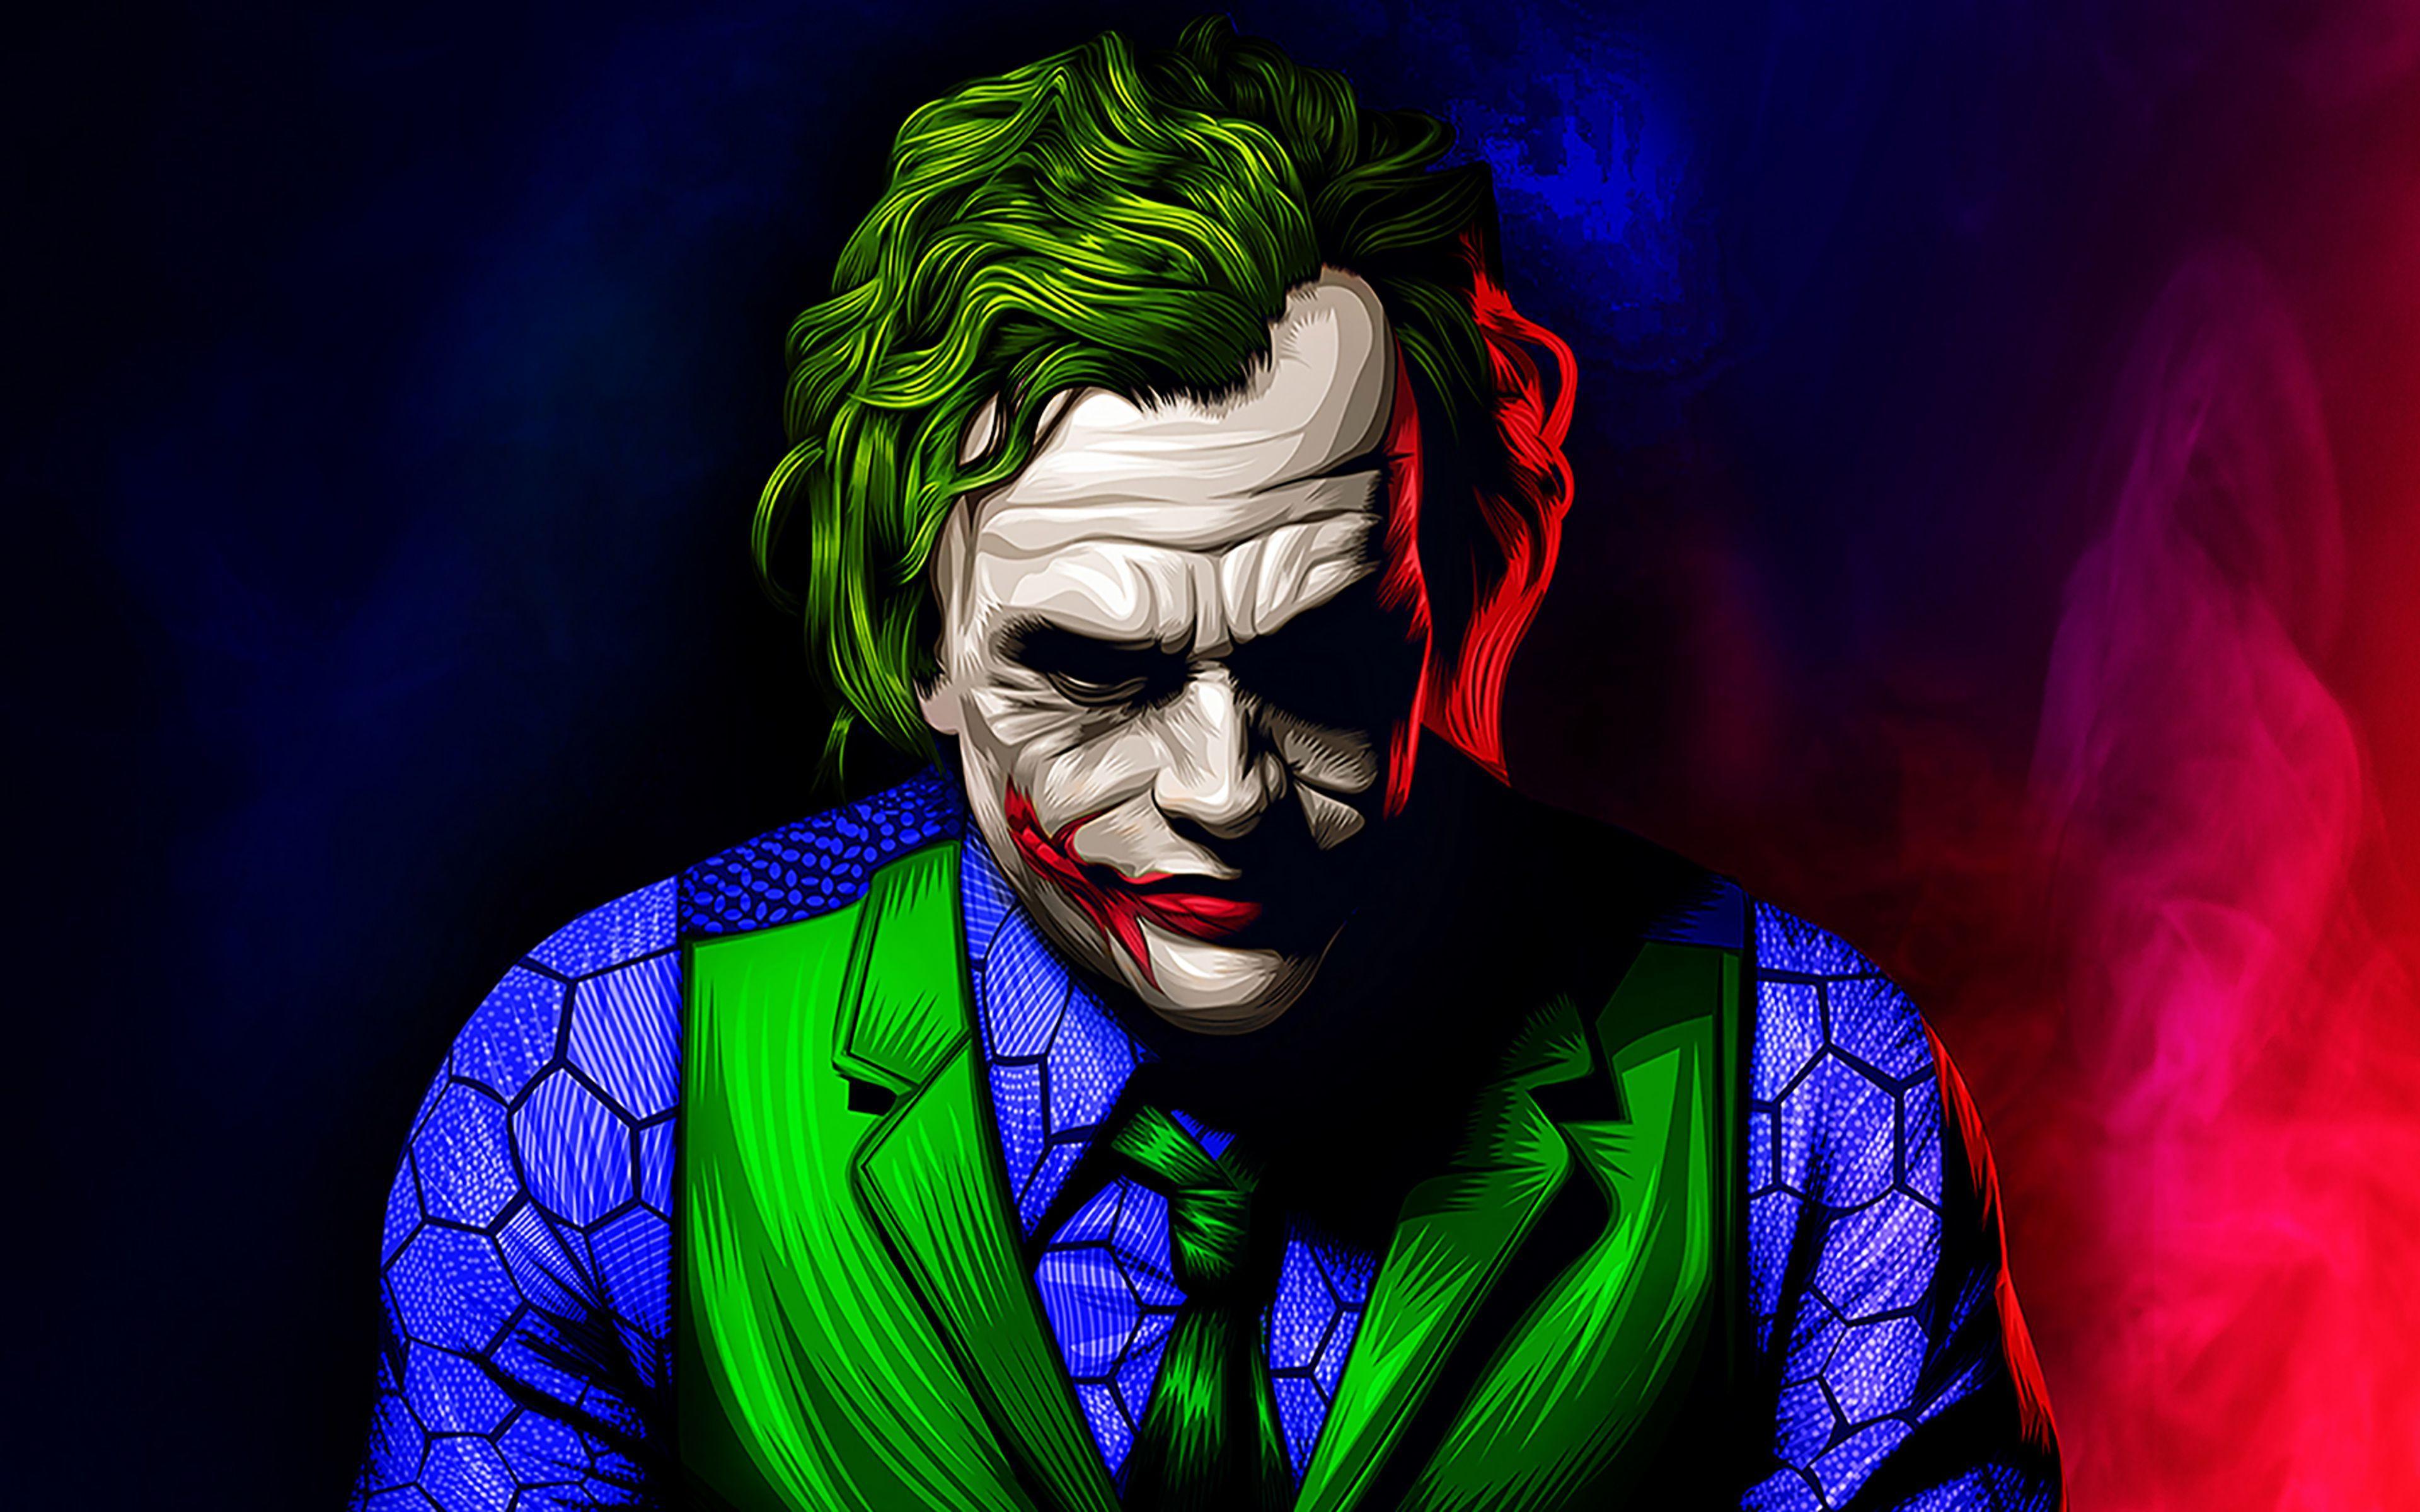 Abstract Joker Wallpapers - Top Free Abstract Joker Backgrounds